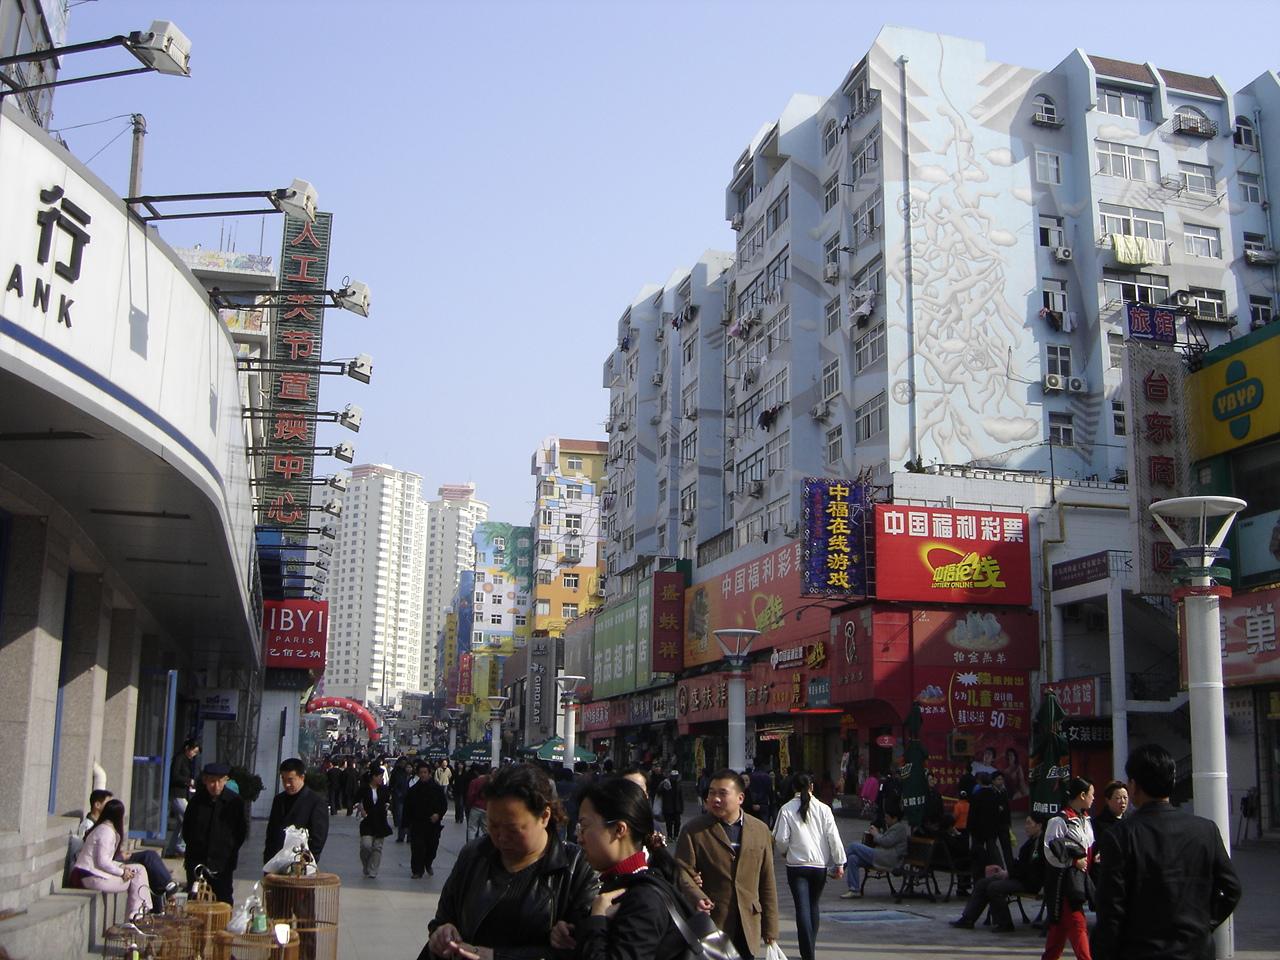 taidong qingdao chine